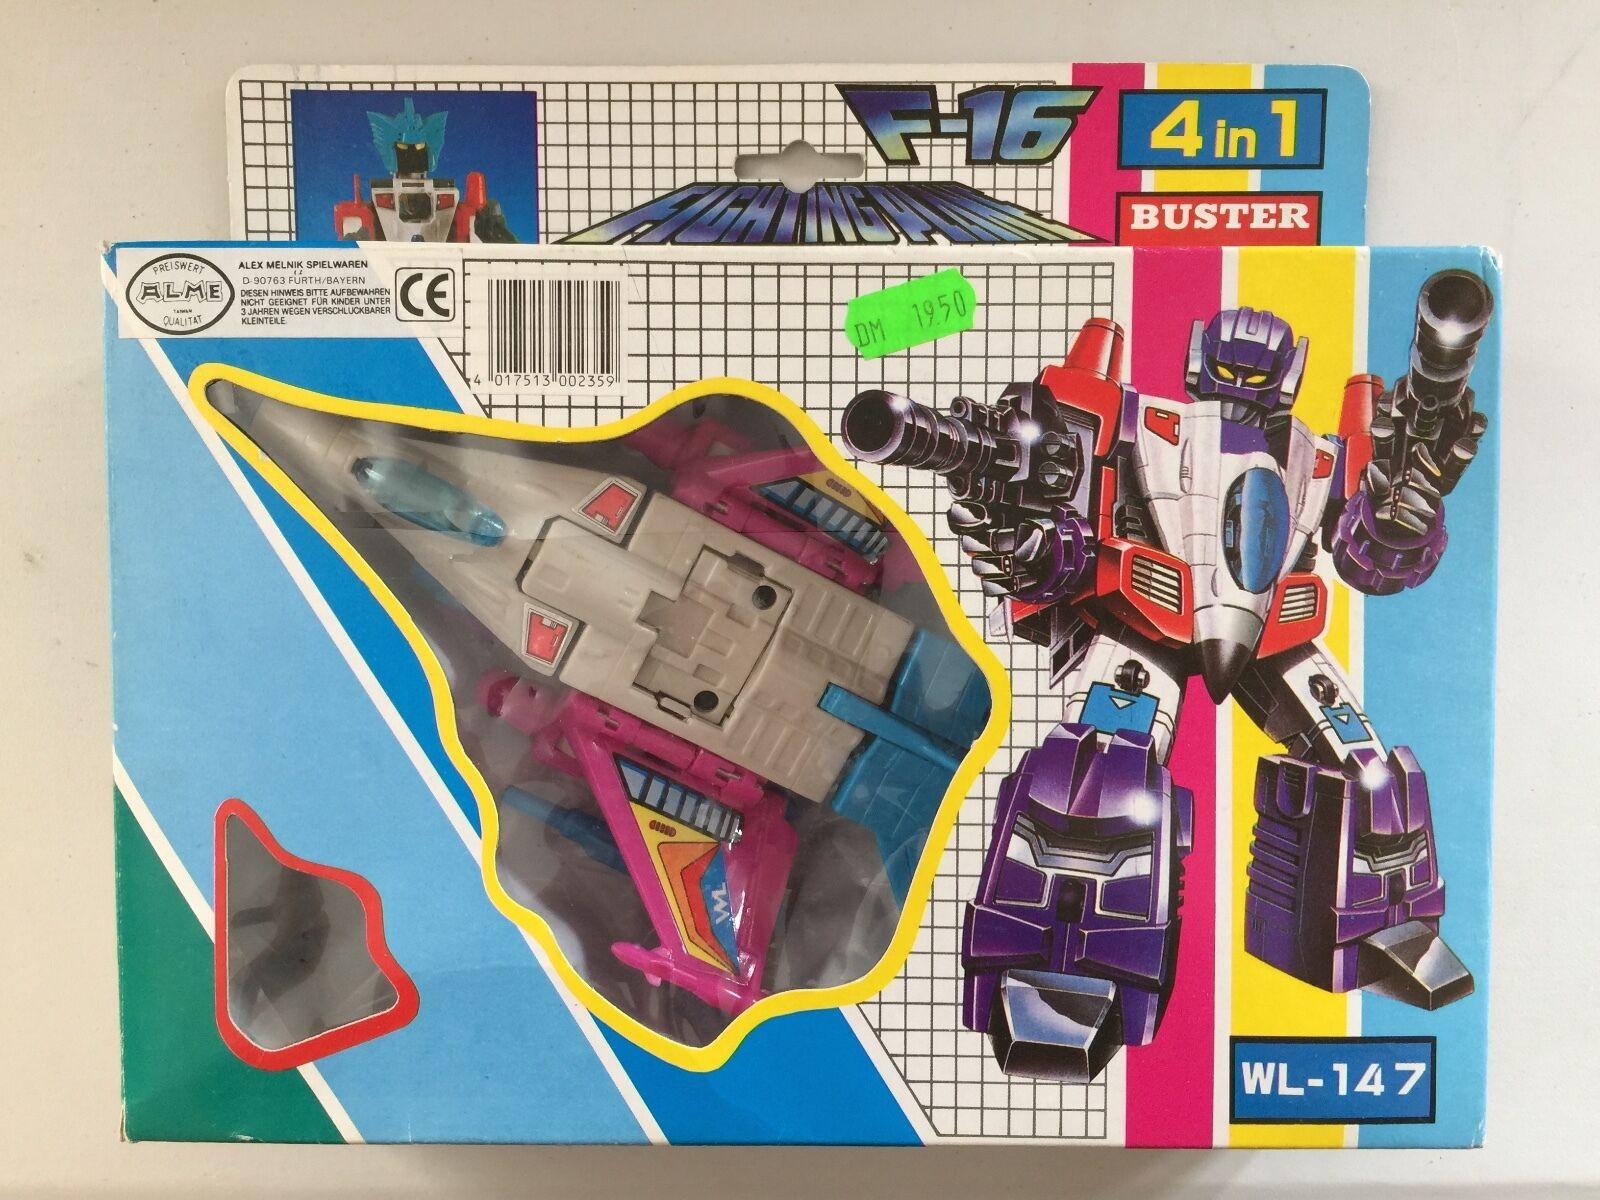 Transformers WL-147 autobusTER robot MIB taiwan energiamaster